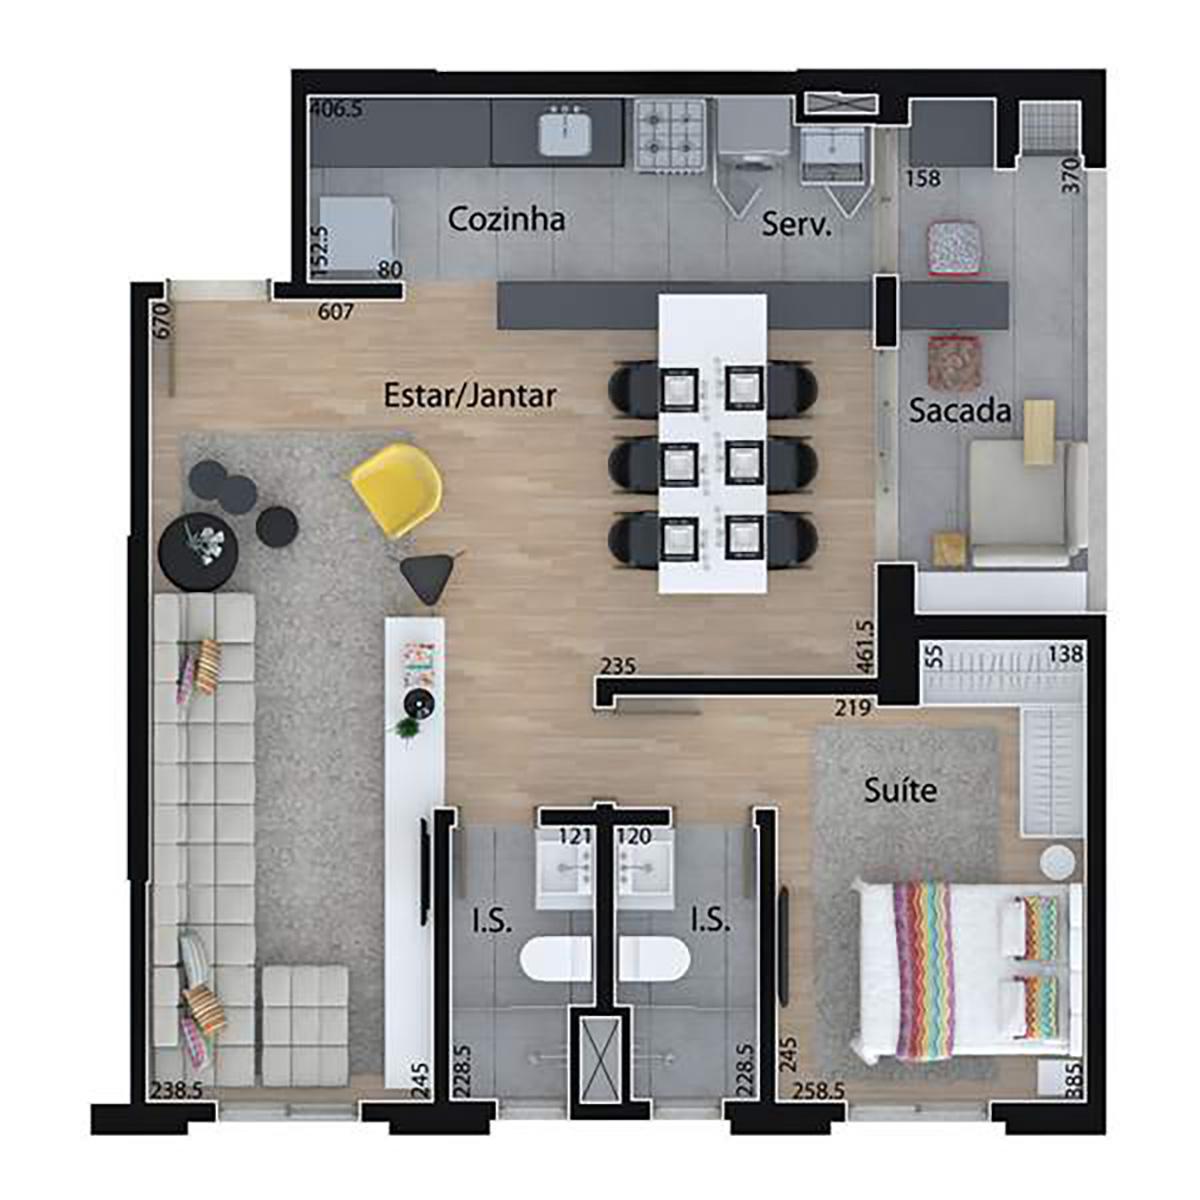 69 m² | 1 Dorm com Sala Ampliada Mid Home